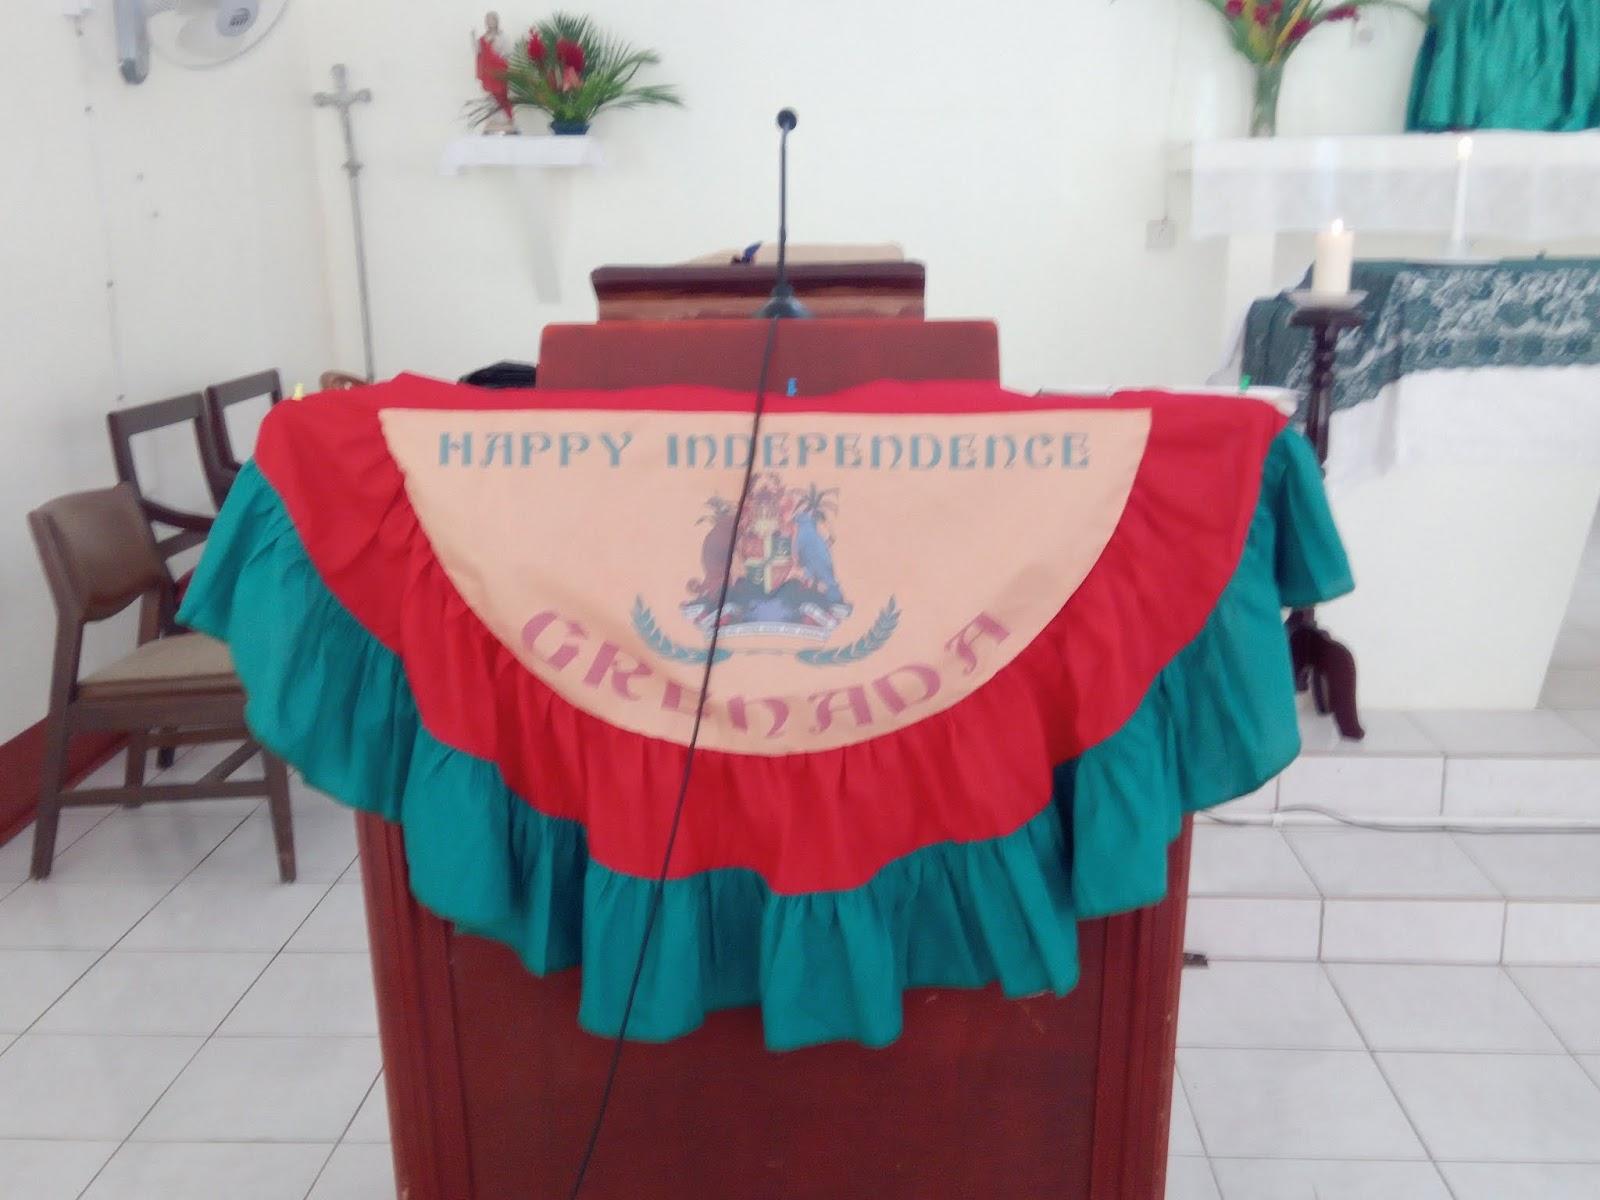 John's Next Step: Grenada Independence 2019